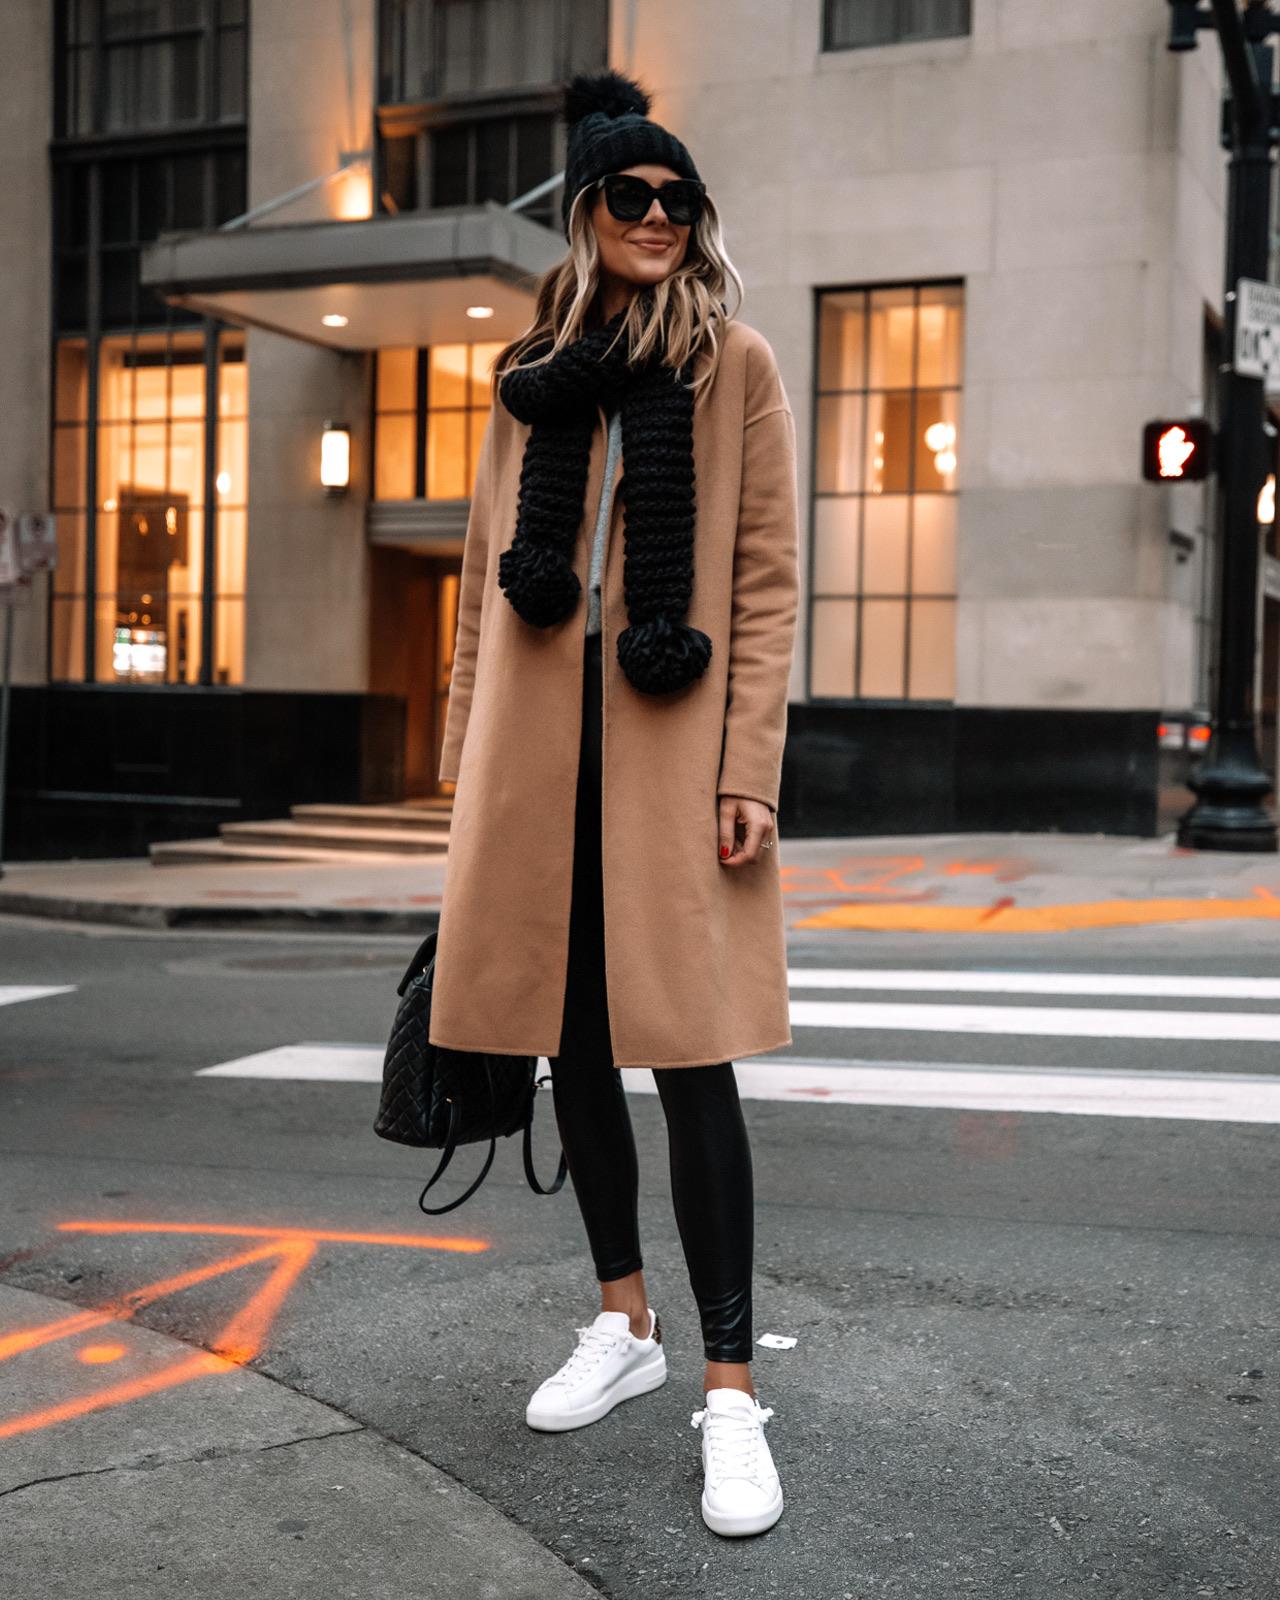 Fashion Jackson Wearing Camel Coat Black Faux Leather Leggings White Sneakers Black Scarf Black Beanie Winter Outfit